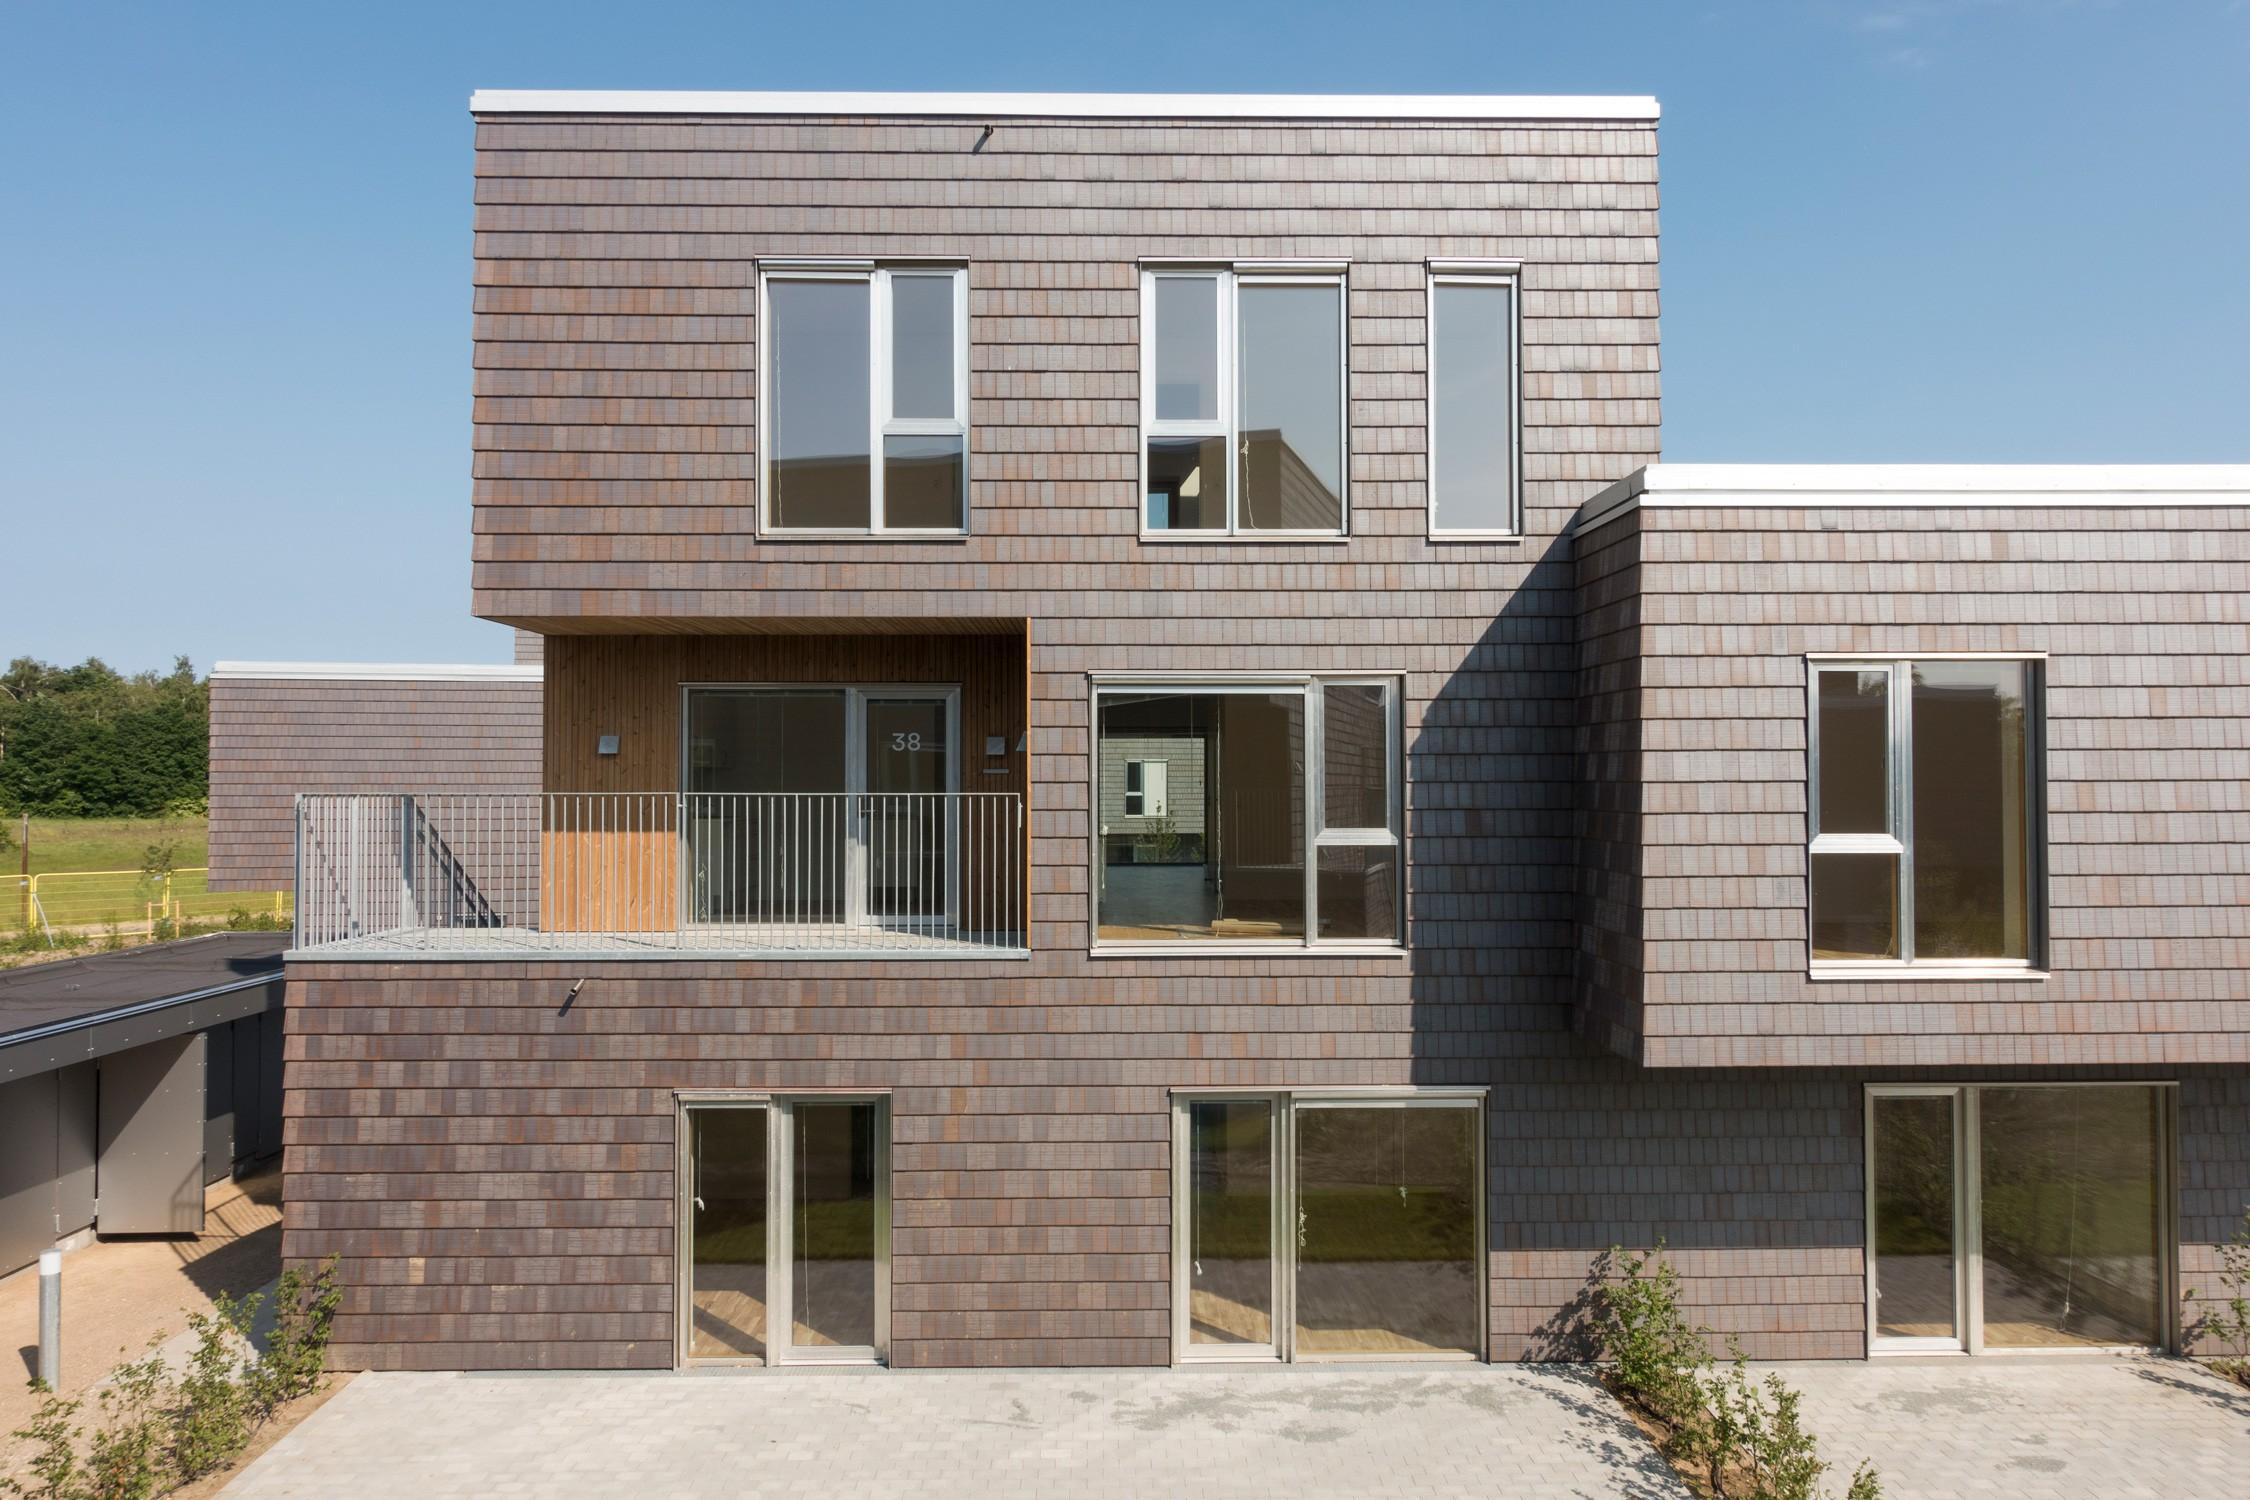 Robinievej-Albertslund-Bo-Vest-ONV-arkitekter-præfab-boliger-præfabrikeret-prefabricated-architect